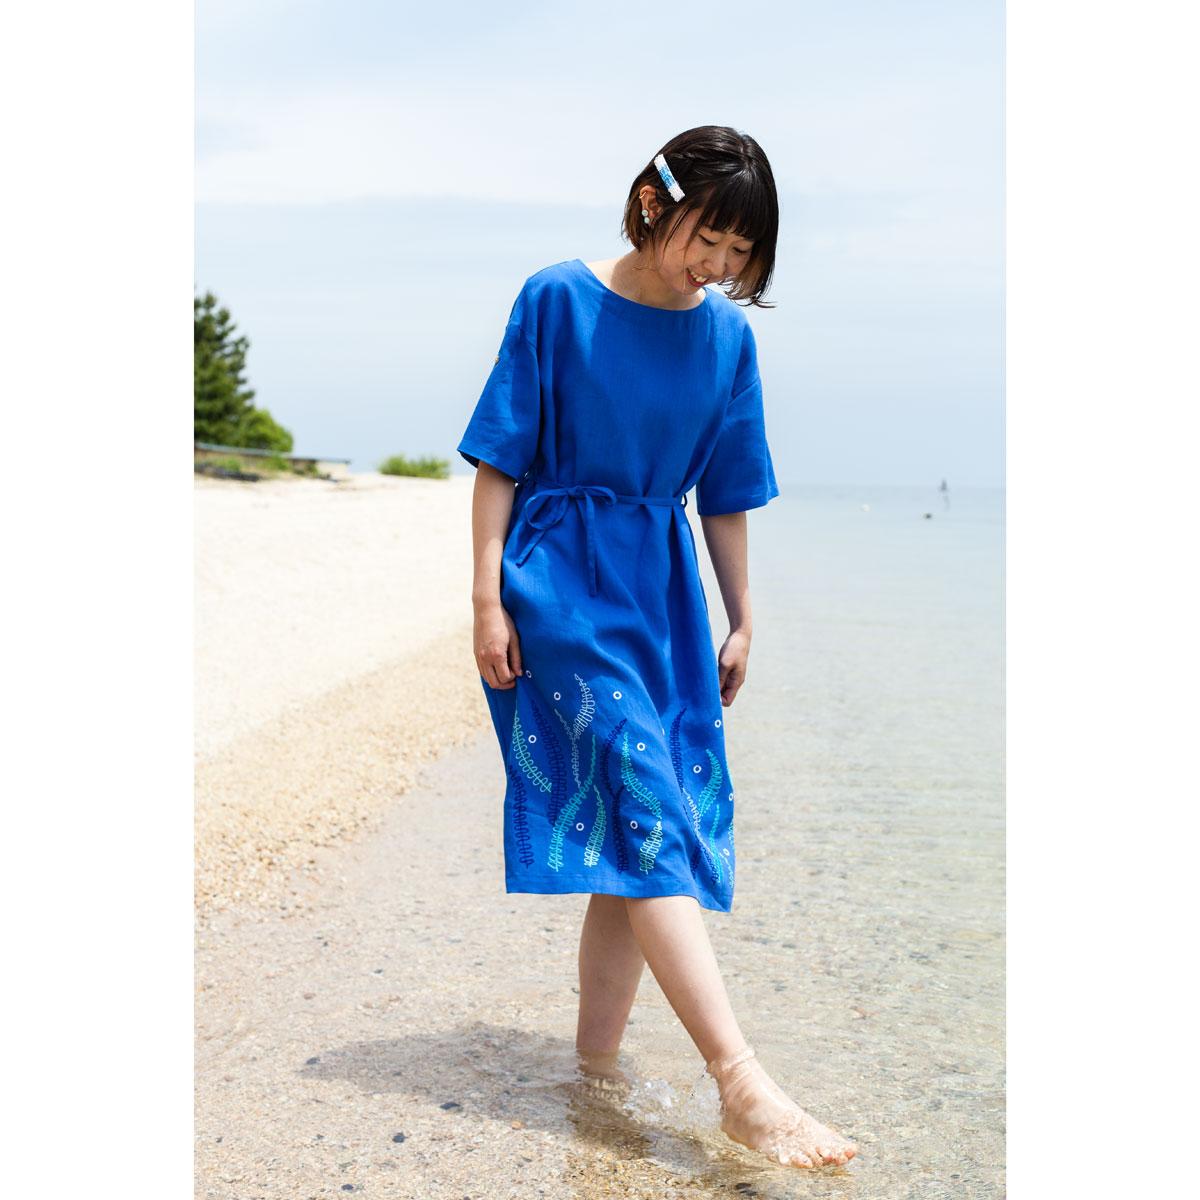 KY26-690/ロールアップスリーブワンピース/海藻〈青〉